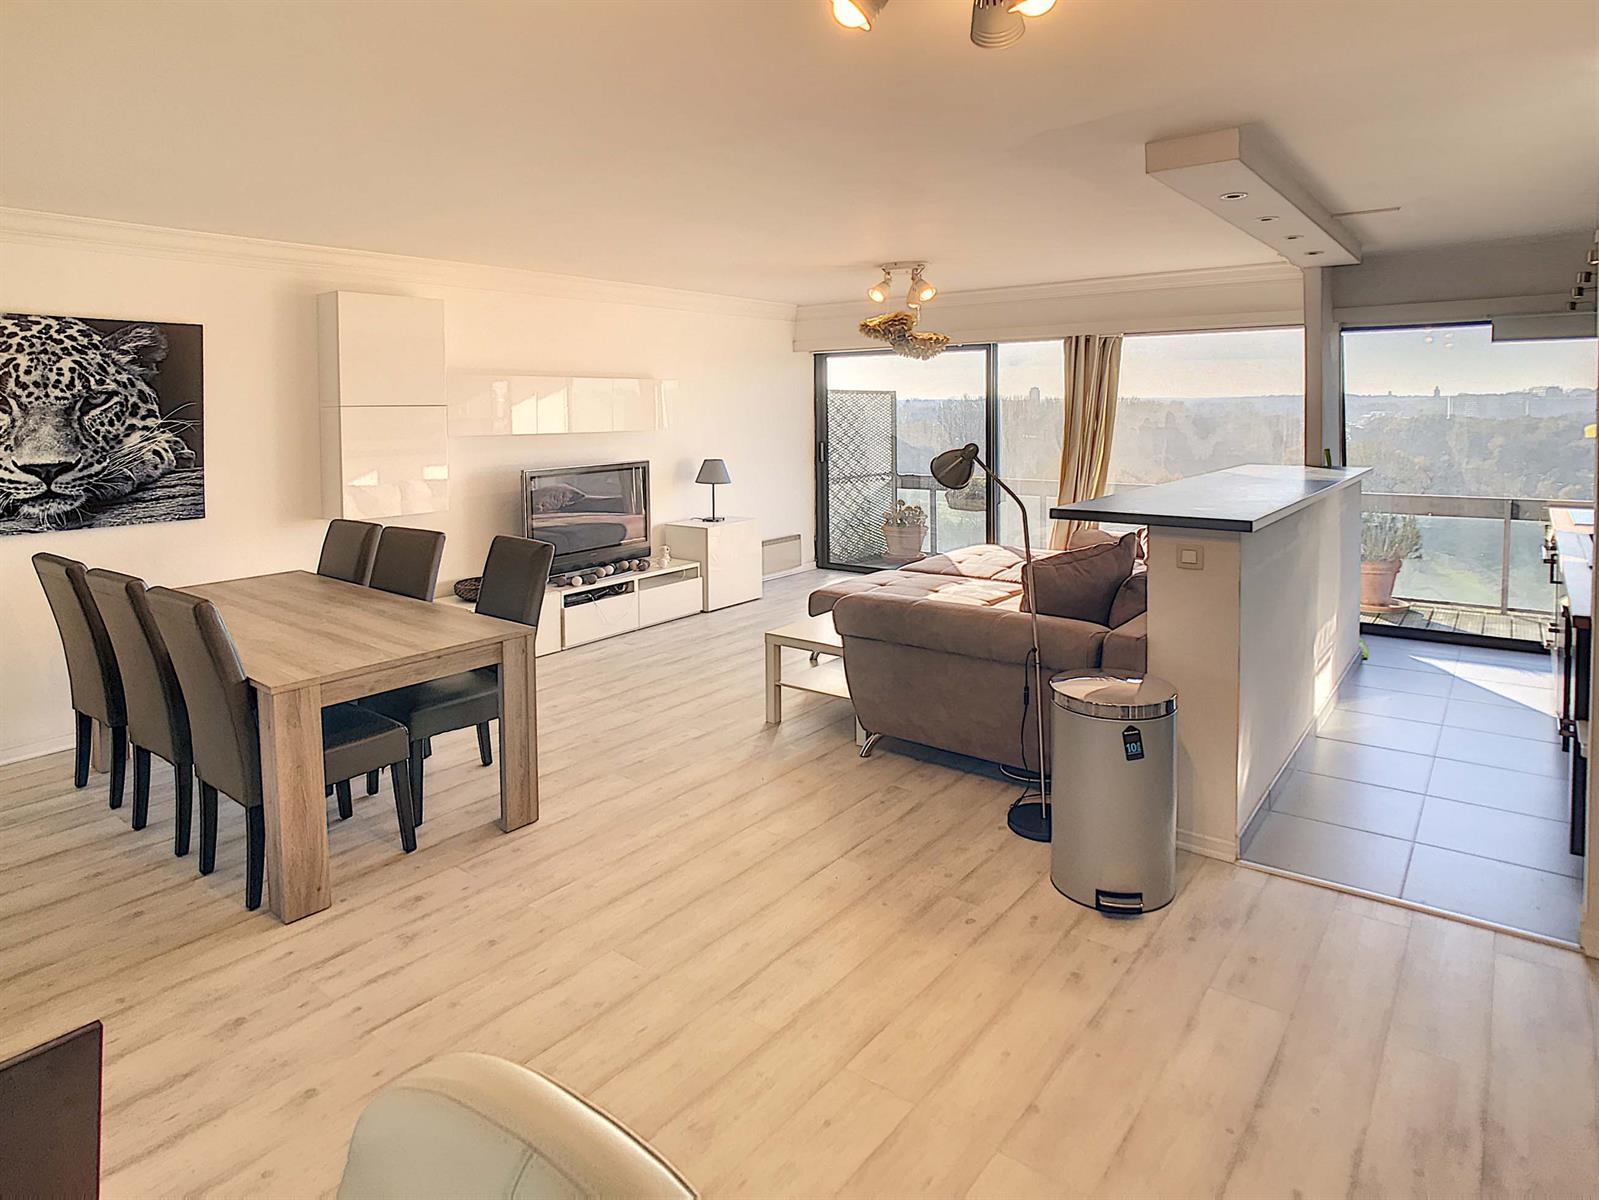 Appartement - Zaventem Sint-Stevens-Woluwe - #4218075-0